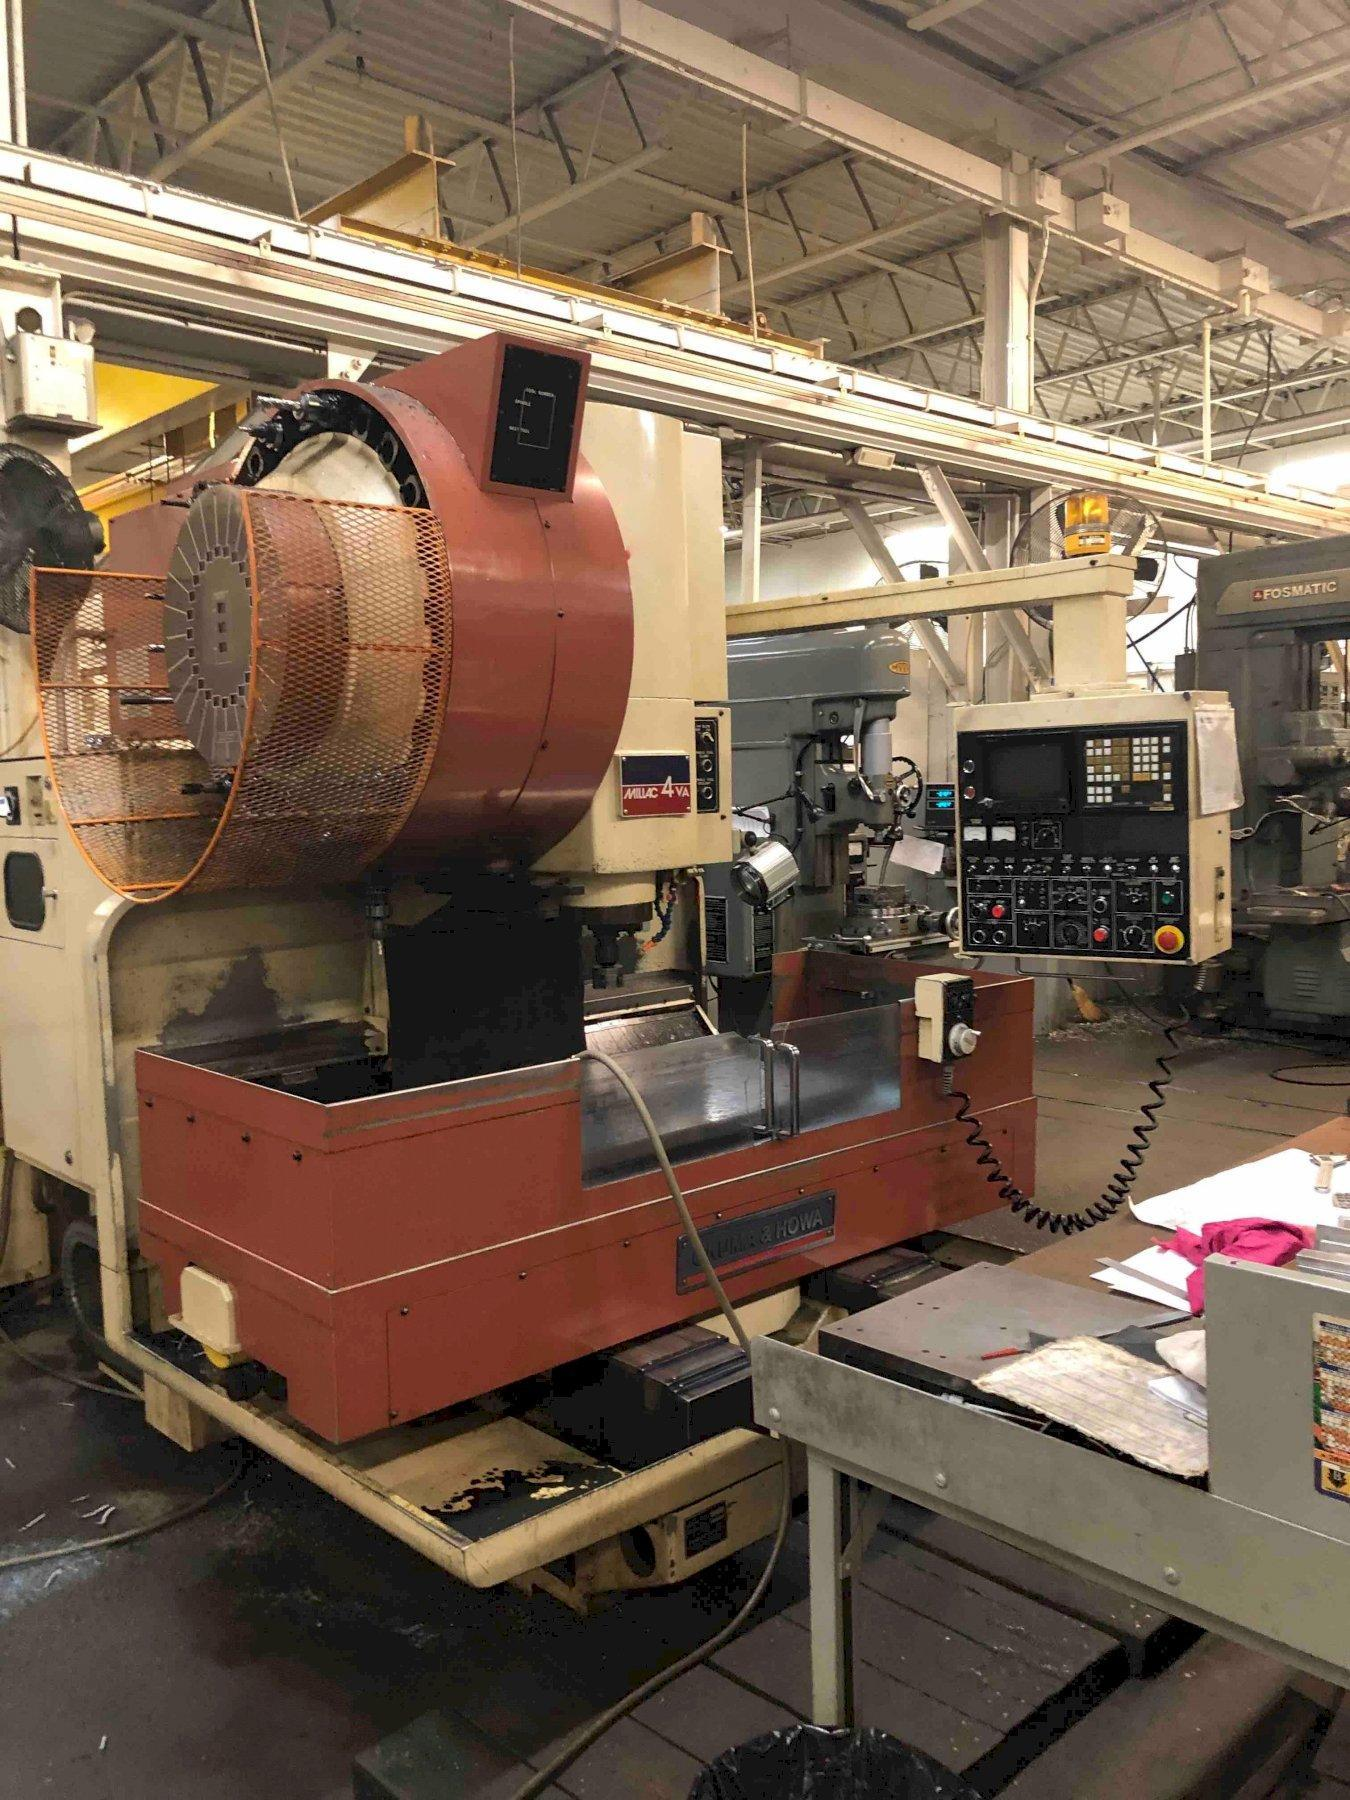 OKUMA & HOWA MILLAC 4VA CNC VERTICAL MACHINING CENTER, FANUC CONTROLS, TOOL CHANGER